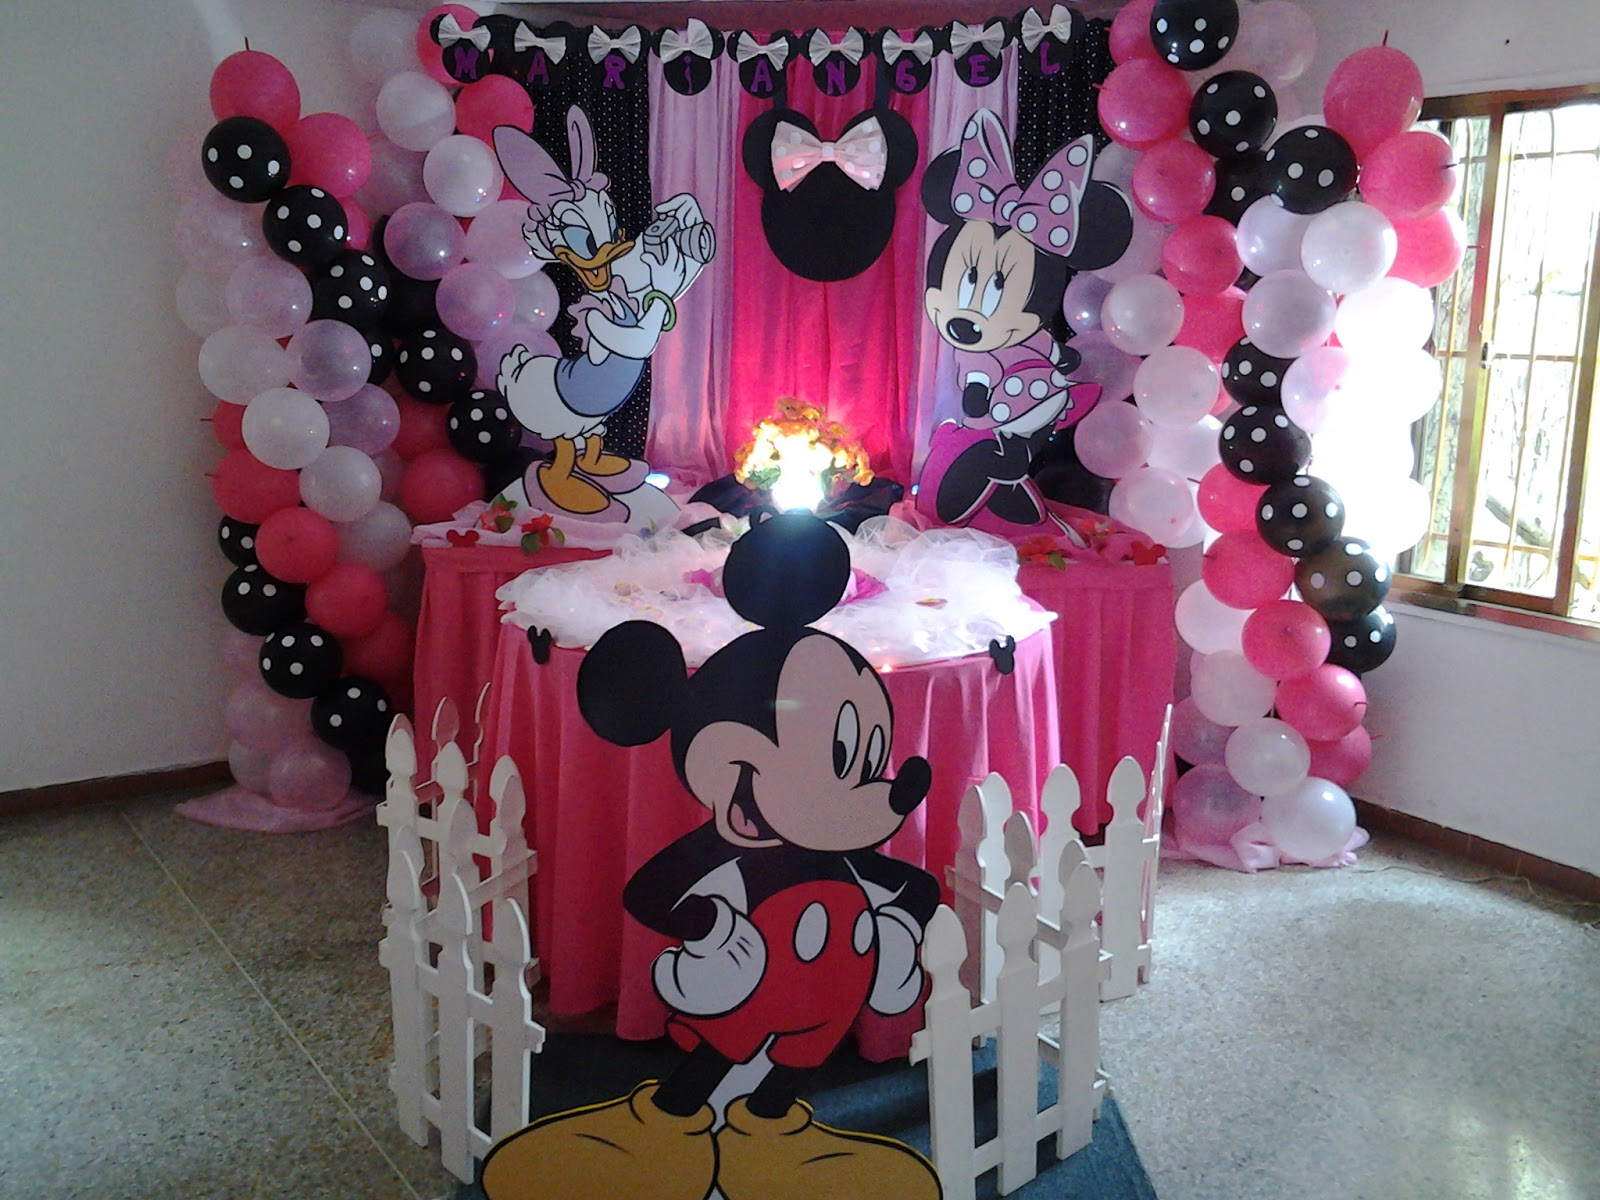 Pkelandia fiesta de minnie mouse cumplea os de mariangel for Paginas de ideas de decoracion